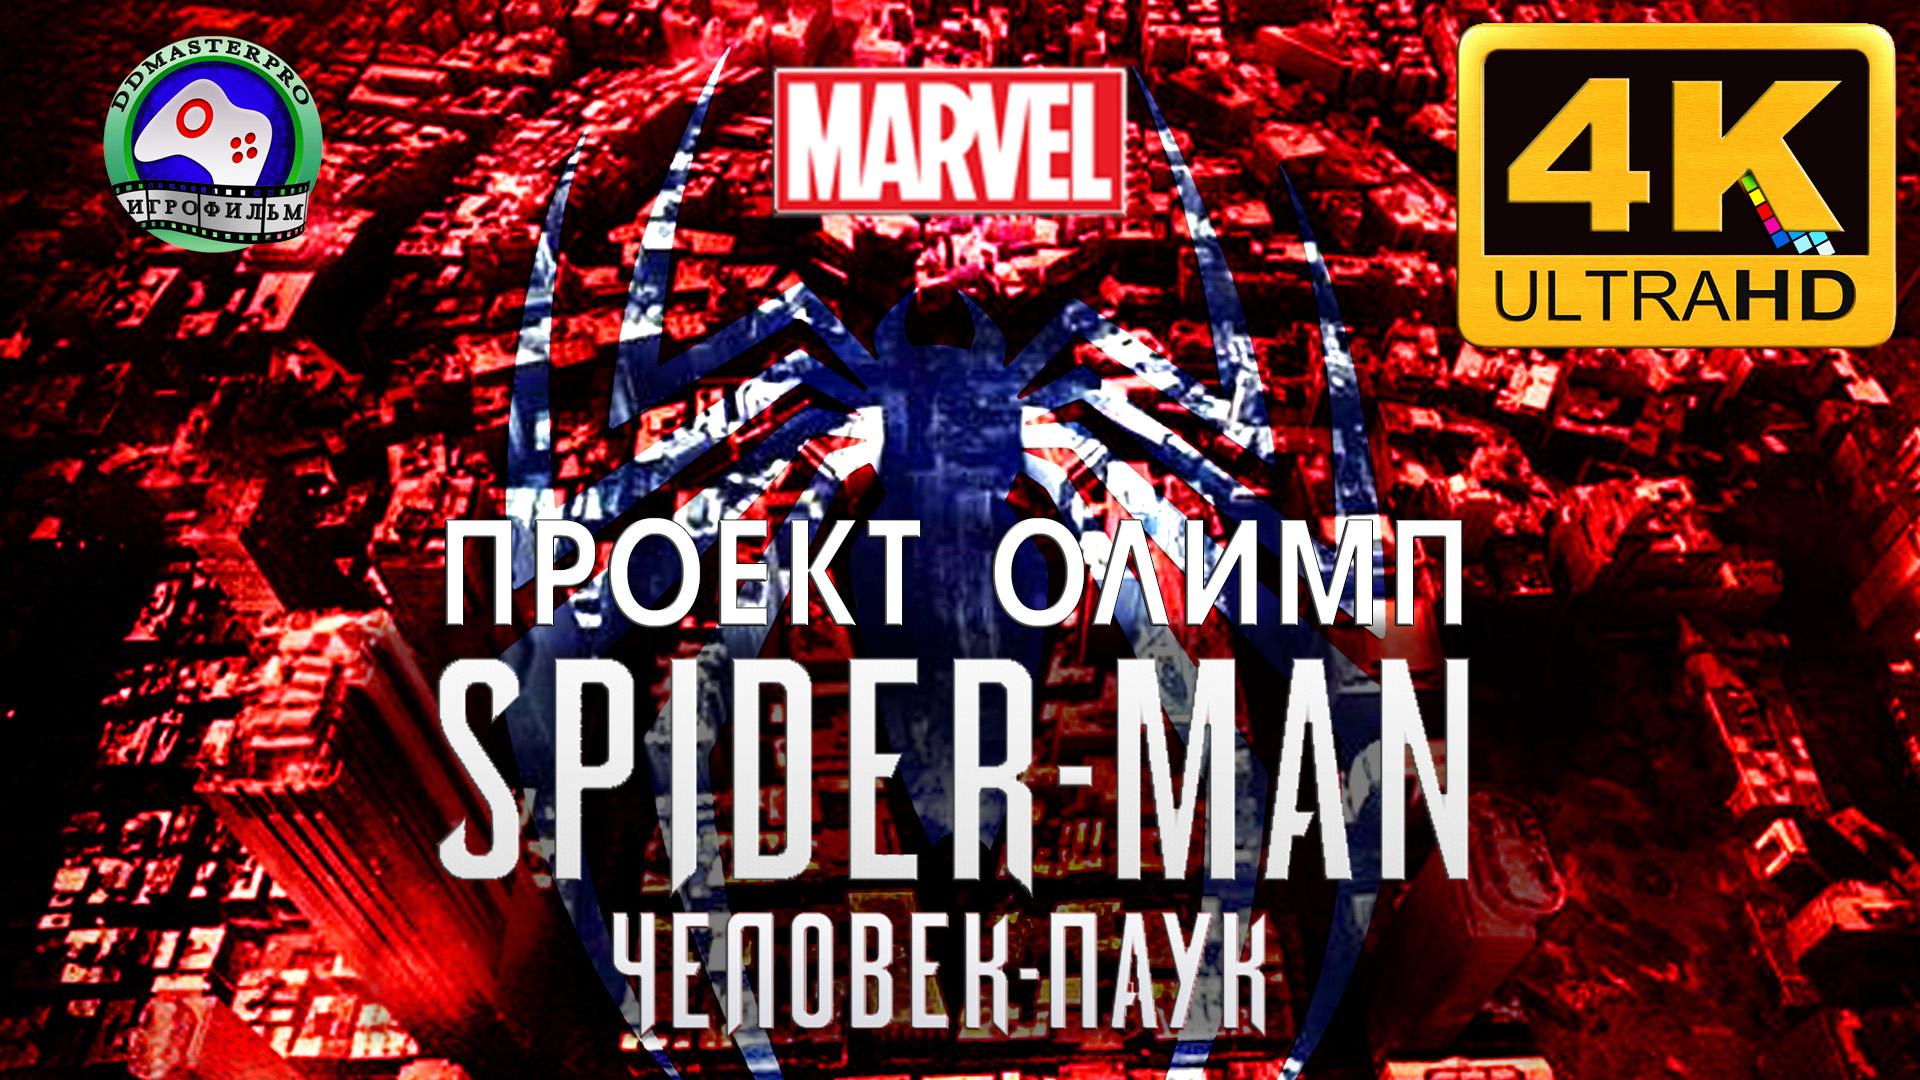 Человек Паук ПРОЕКТ ОЛИМП 4K Marvel SPIDER MAN ИГРОФИЛЬМ сюжет фантастика